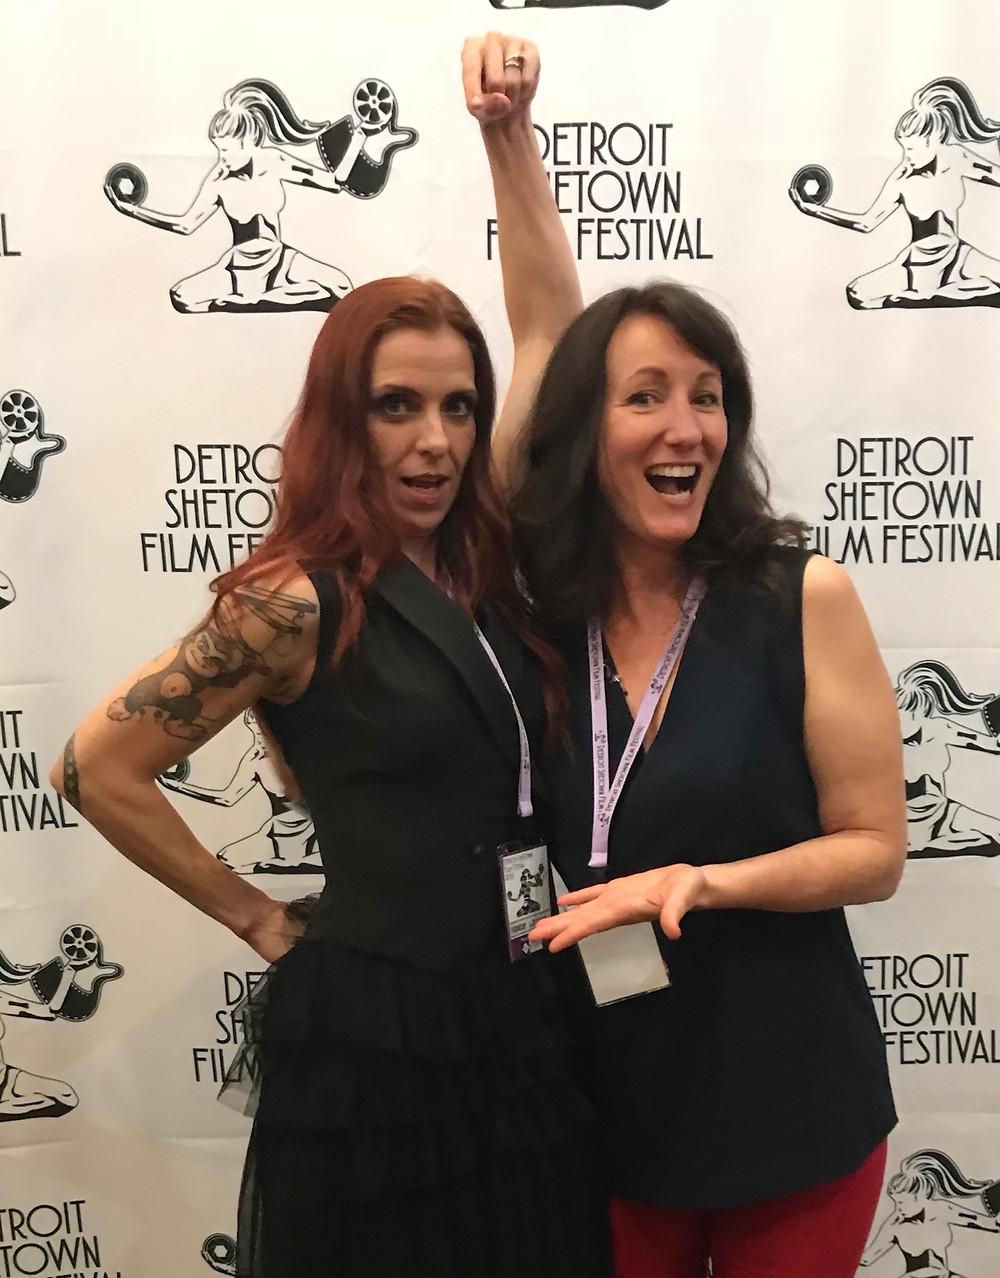 Mandy Loony, Angela Atwood, Detroit Shetown Film Festival